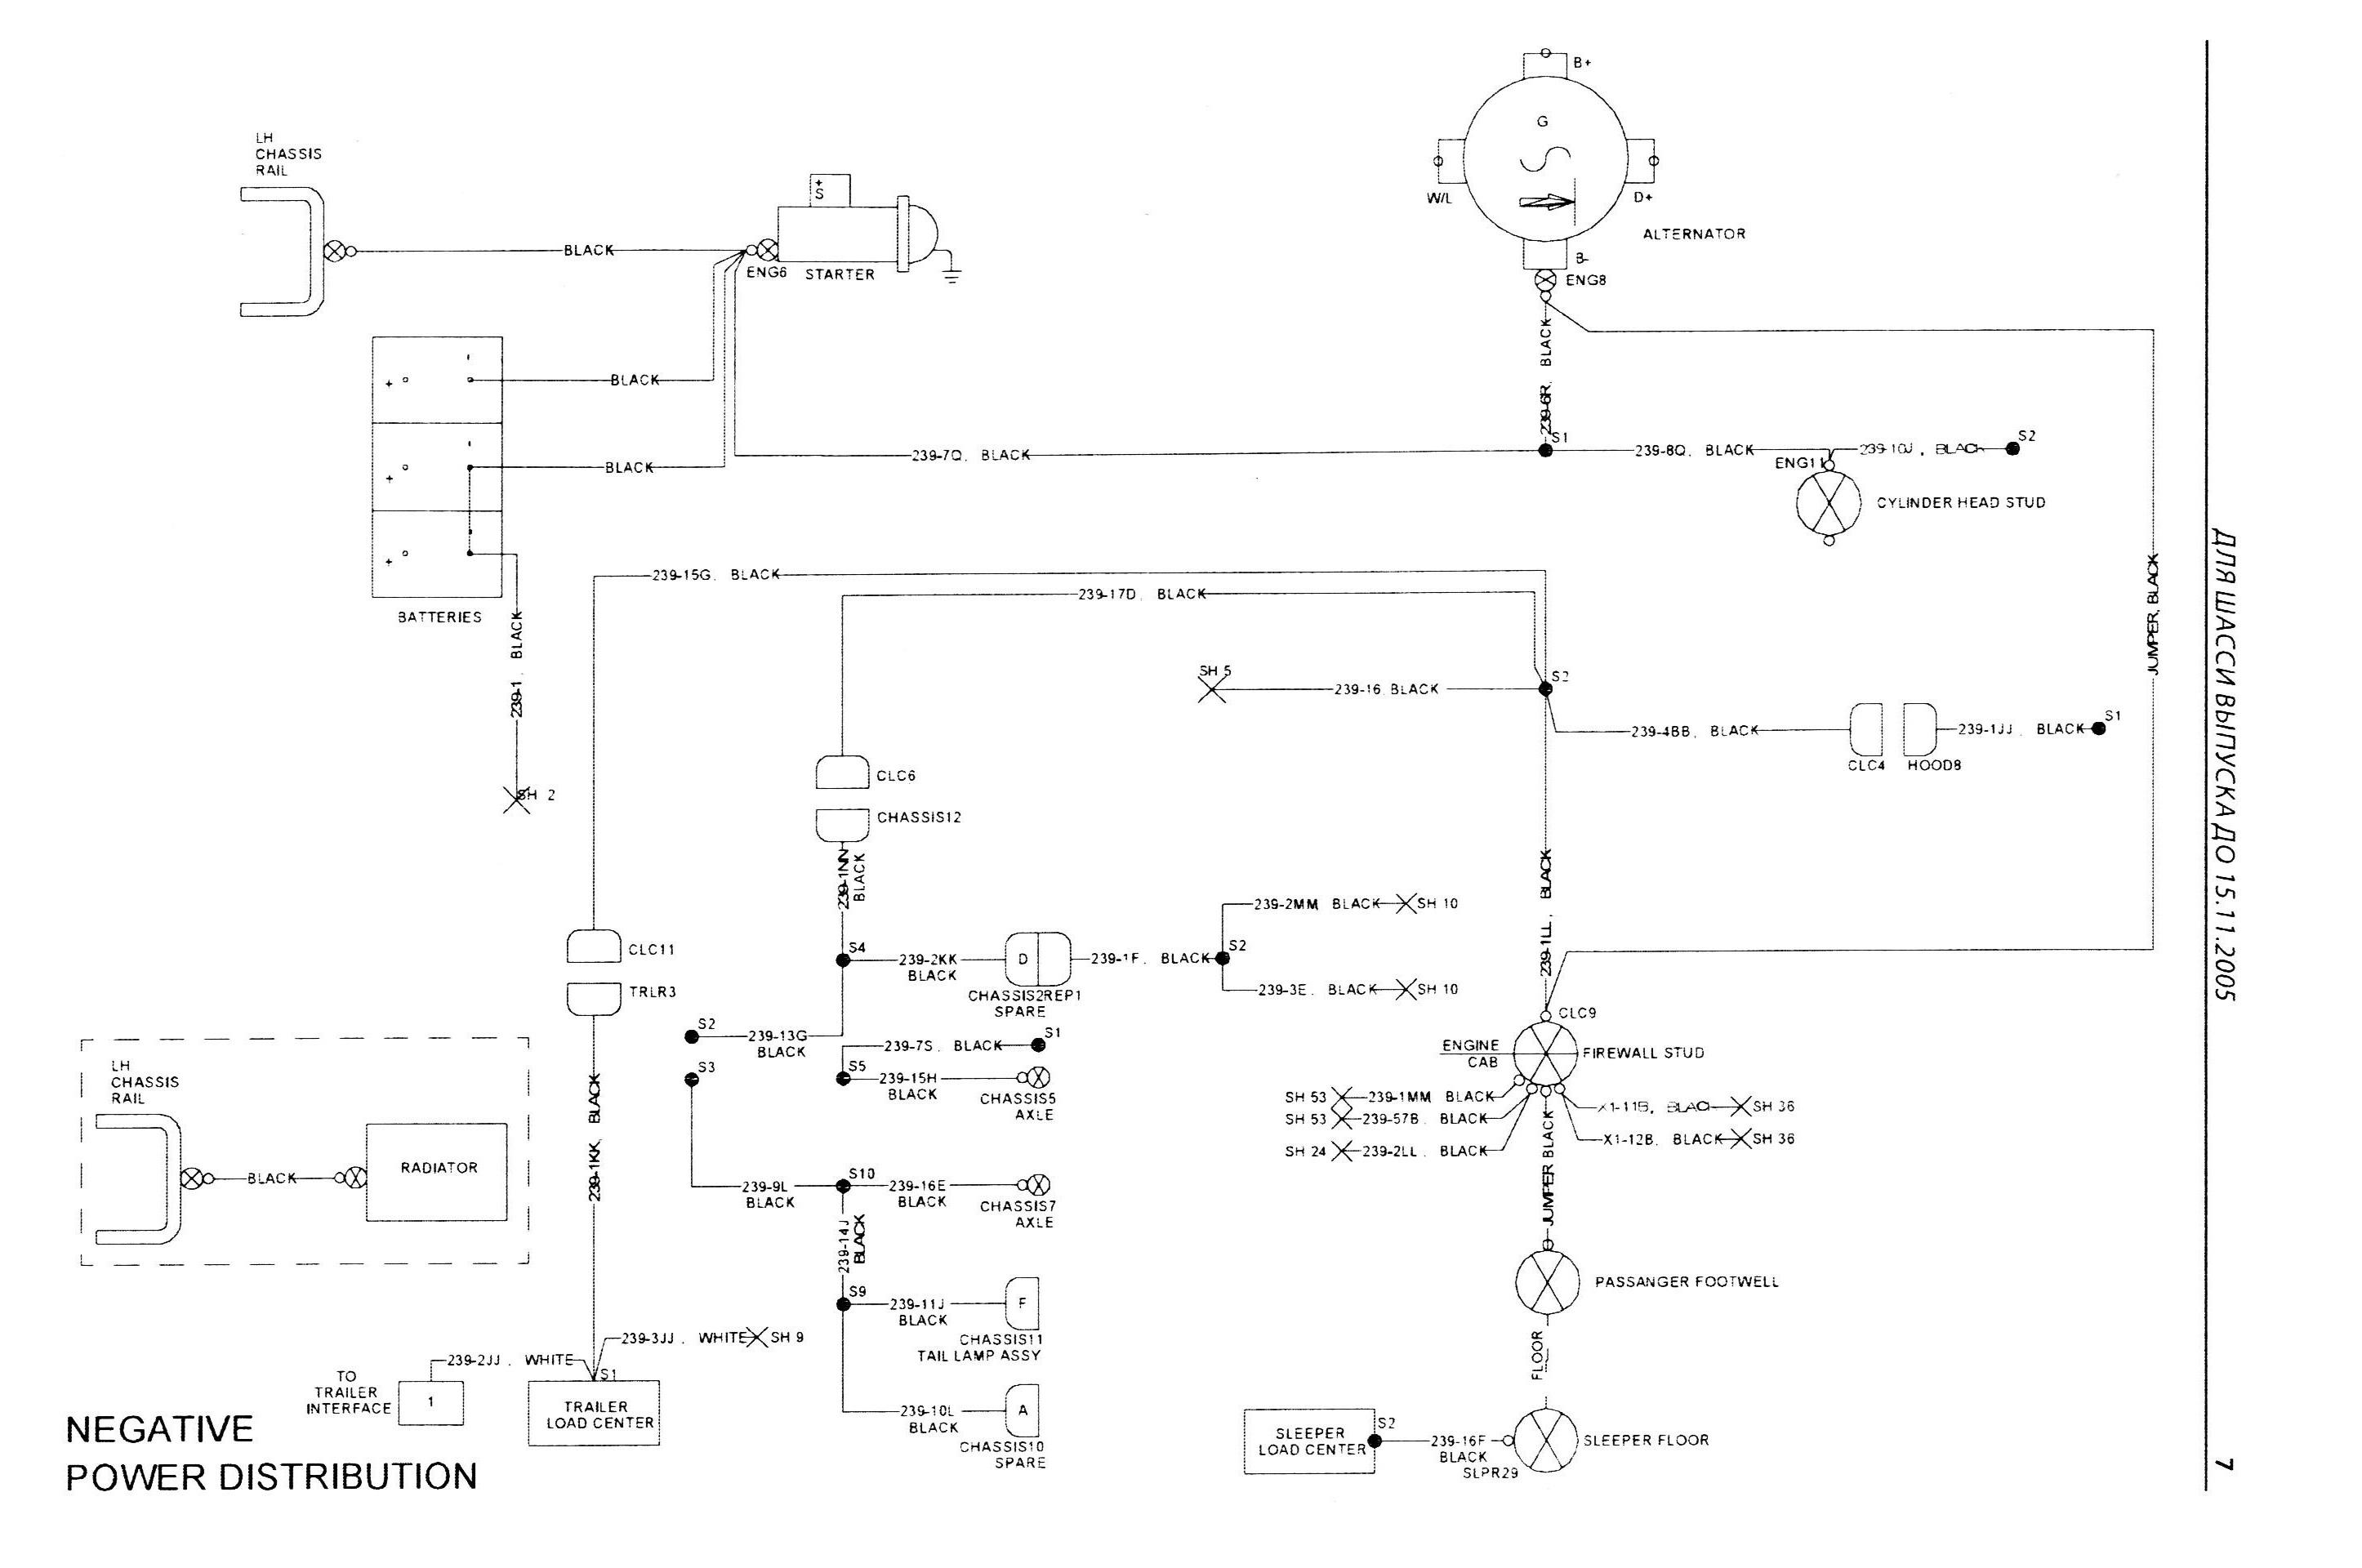 medium resolution of peterbilt 387 hvac wiring diagram jpeg jpg image 473 6 kb download download